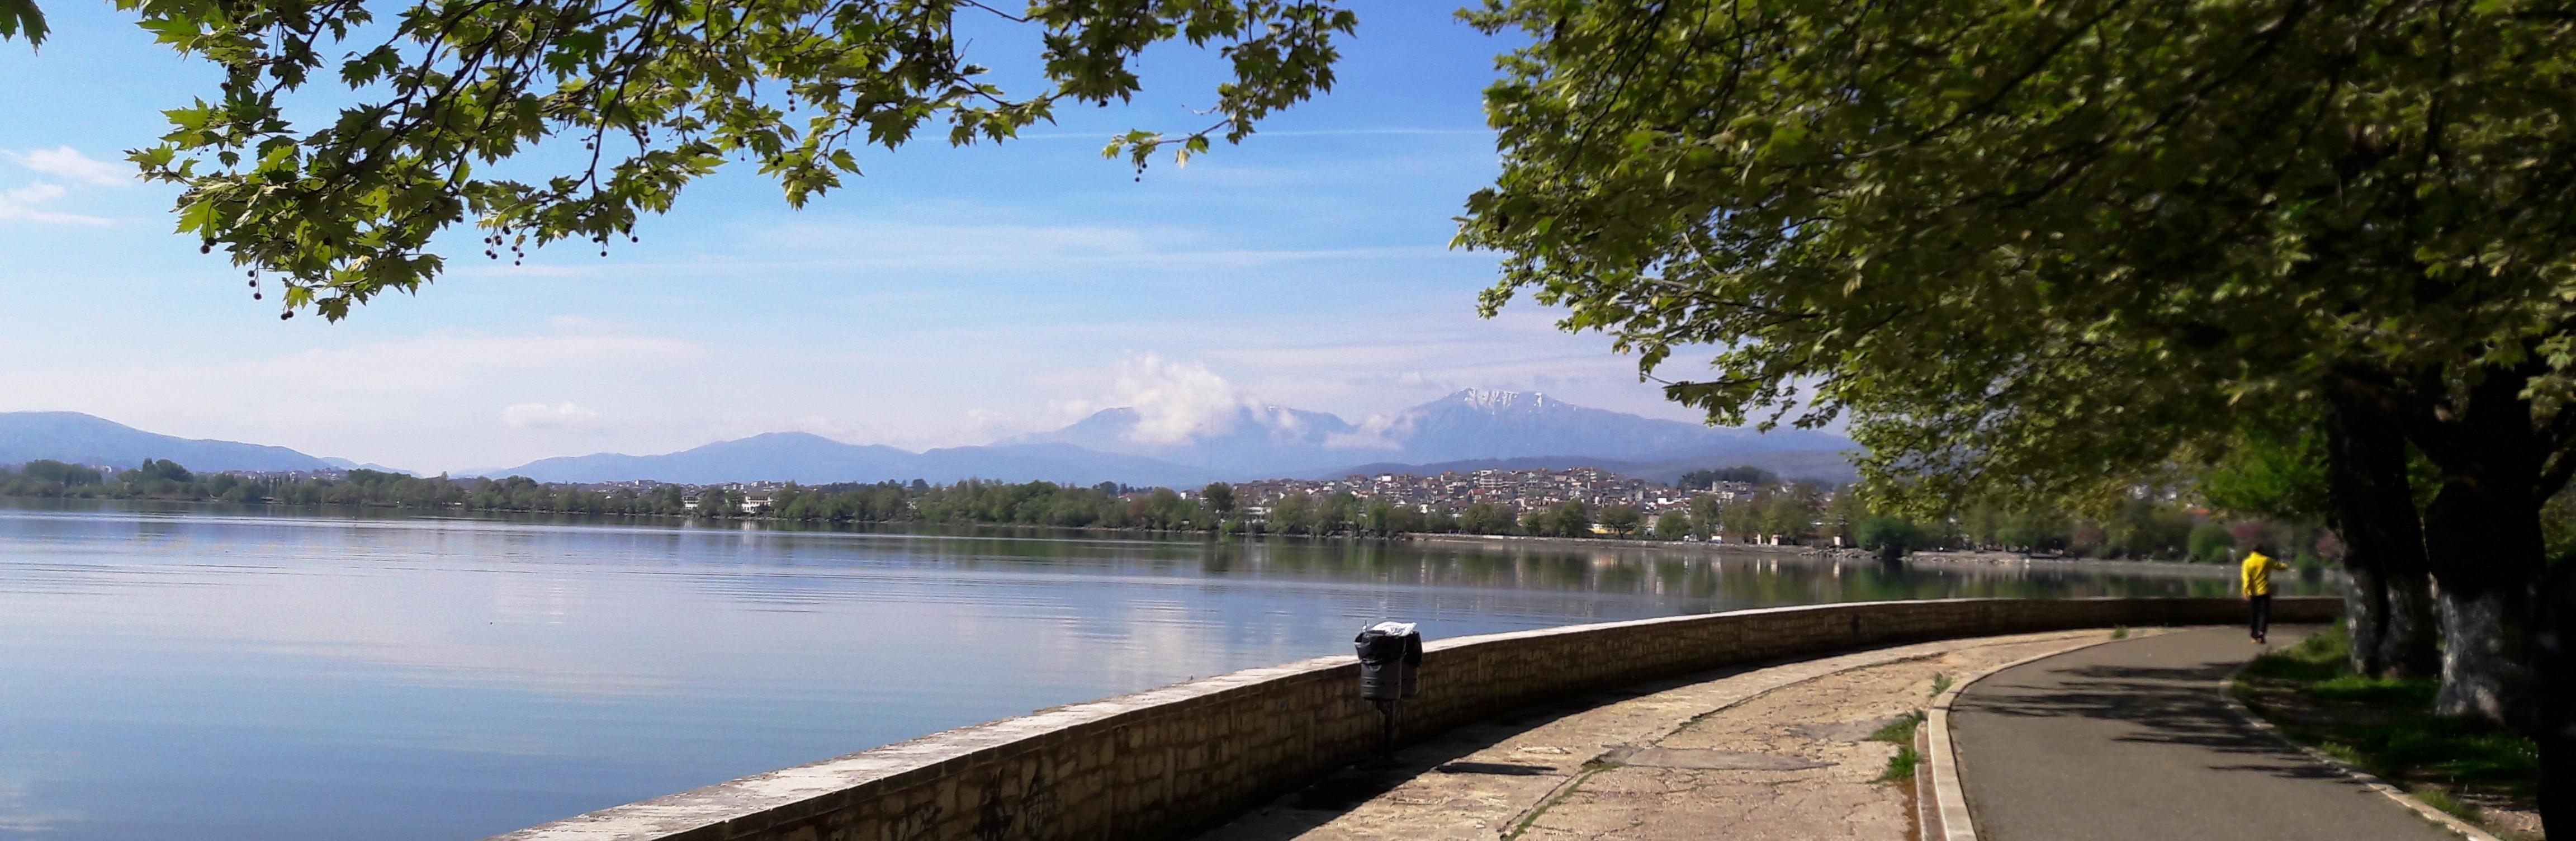 Onderweg_Ioannina_Banner_01